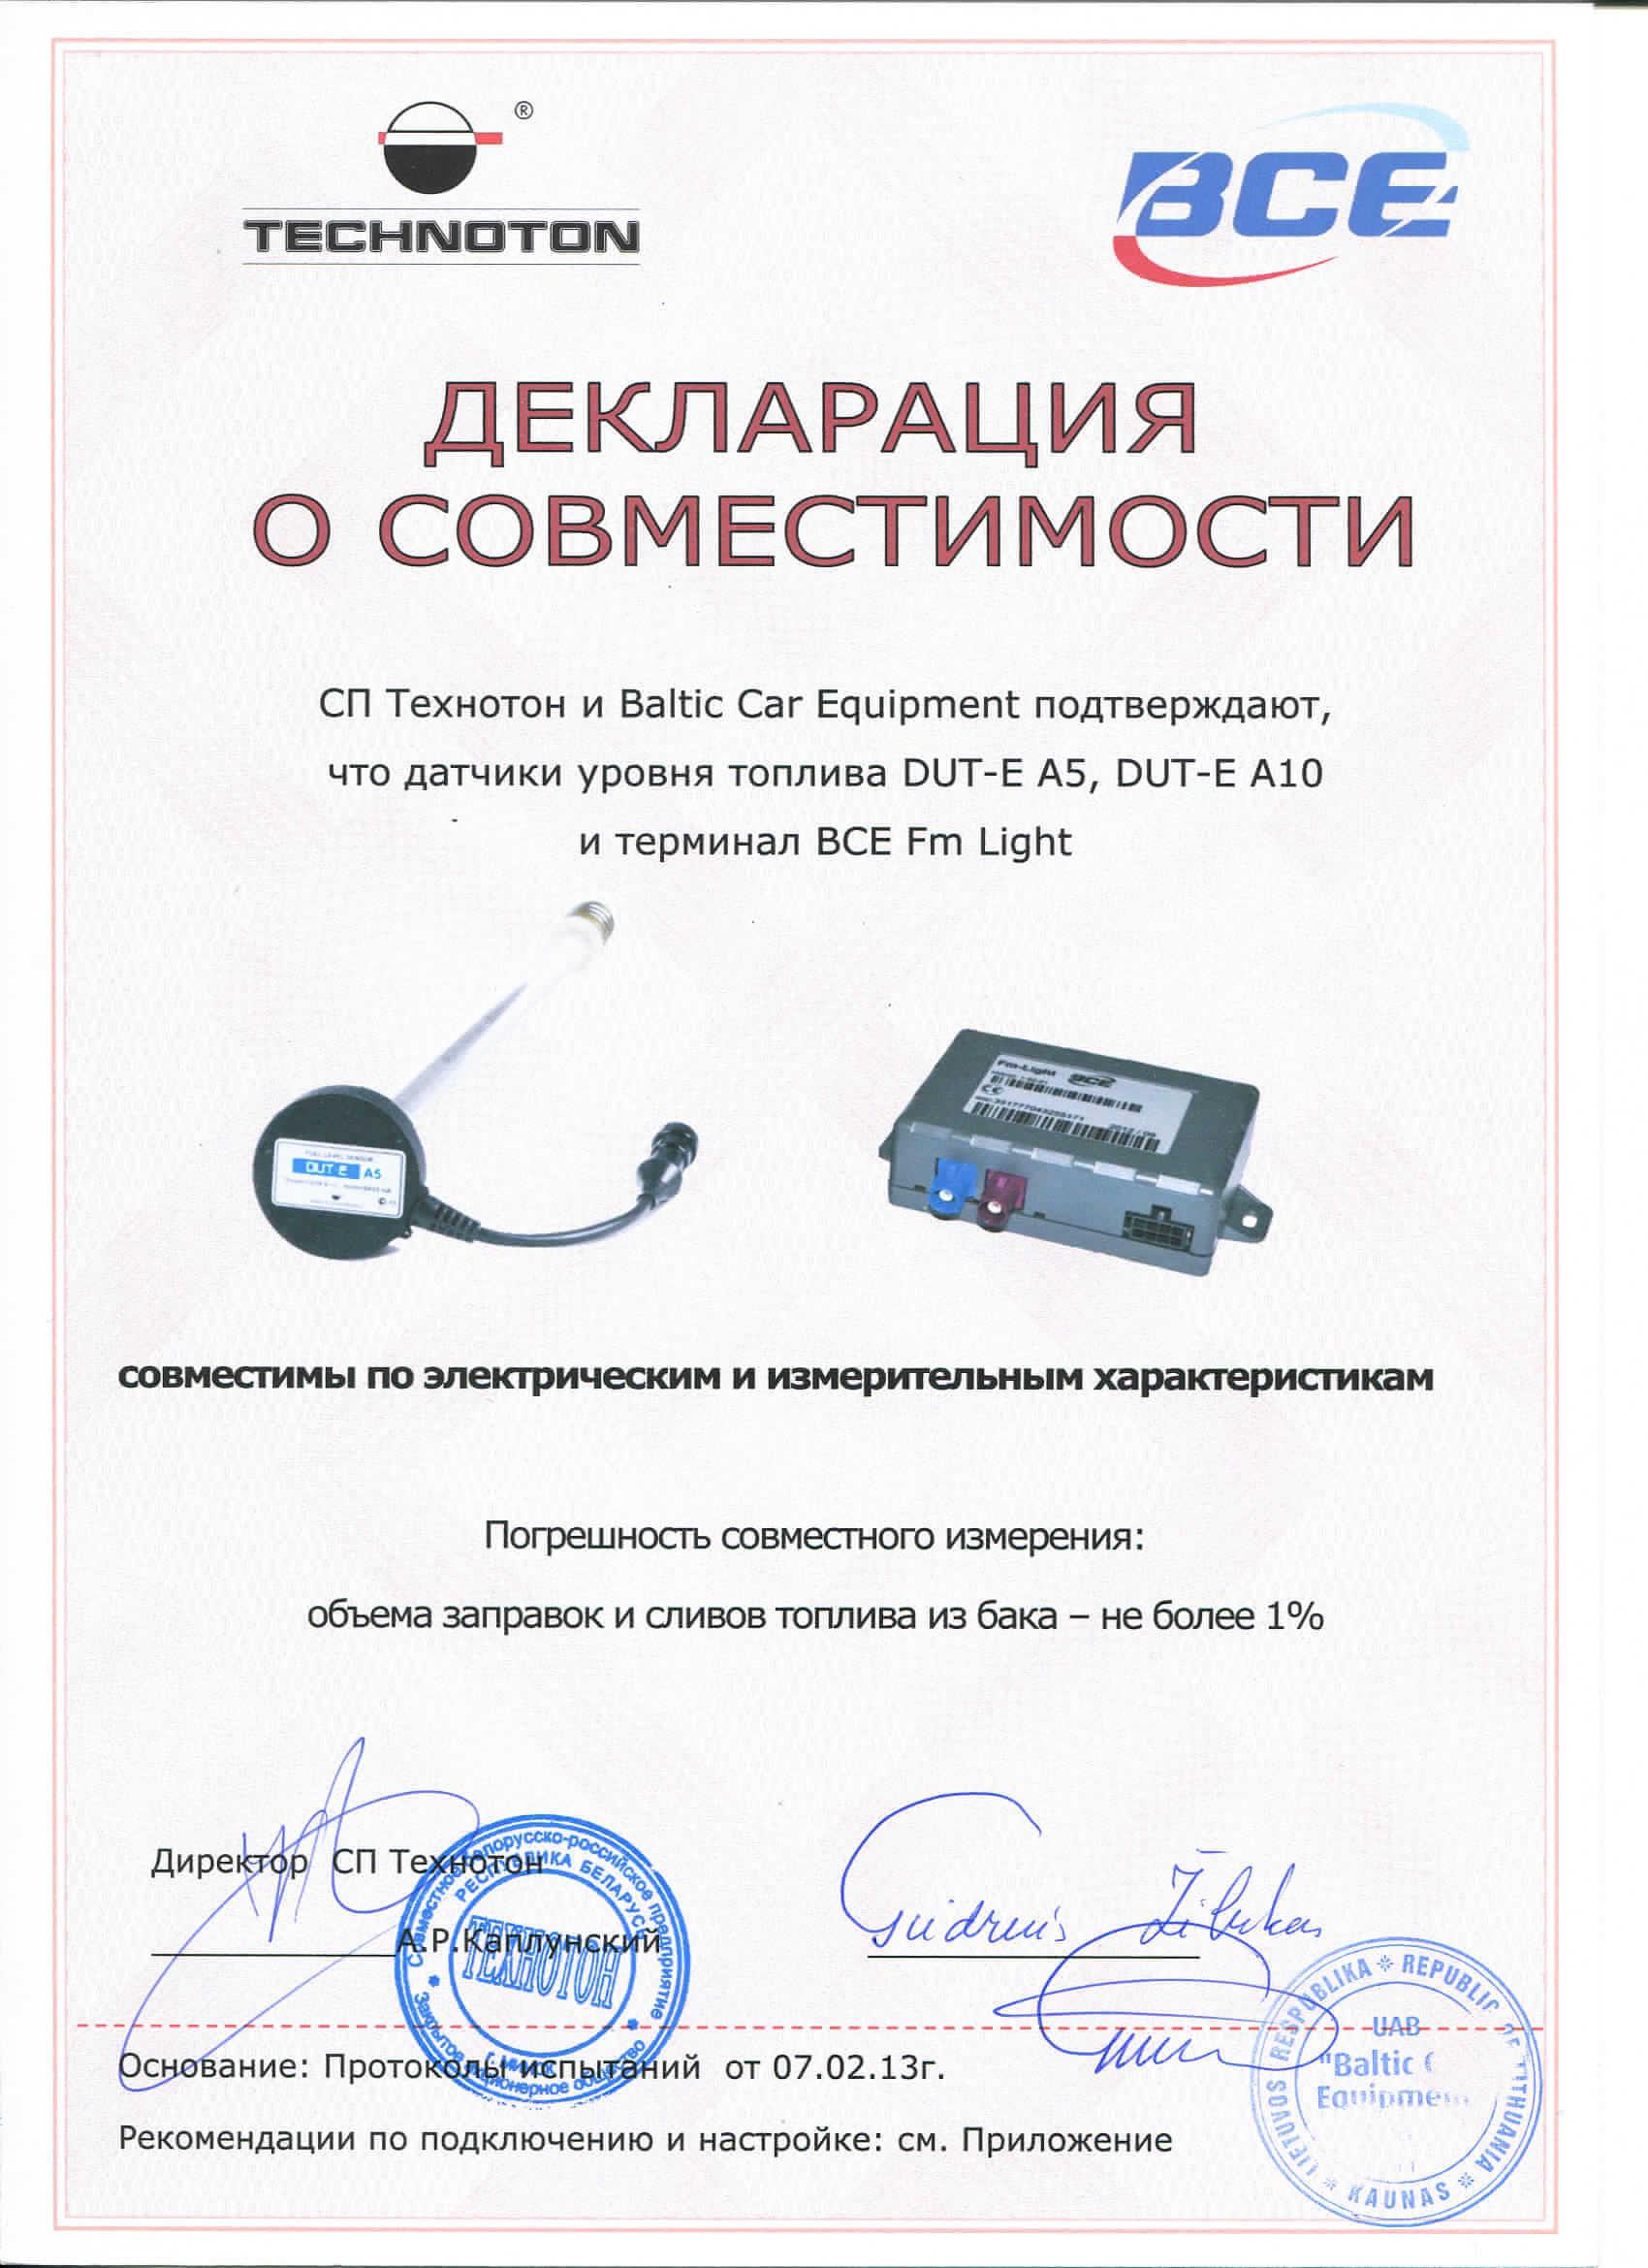 DUT-E A5-A10 совместим с BCE-FM